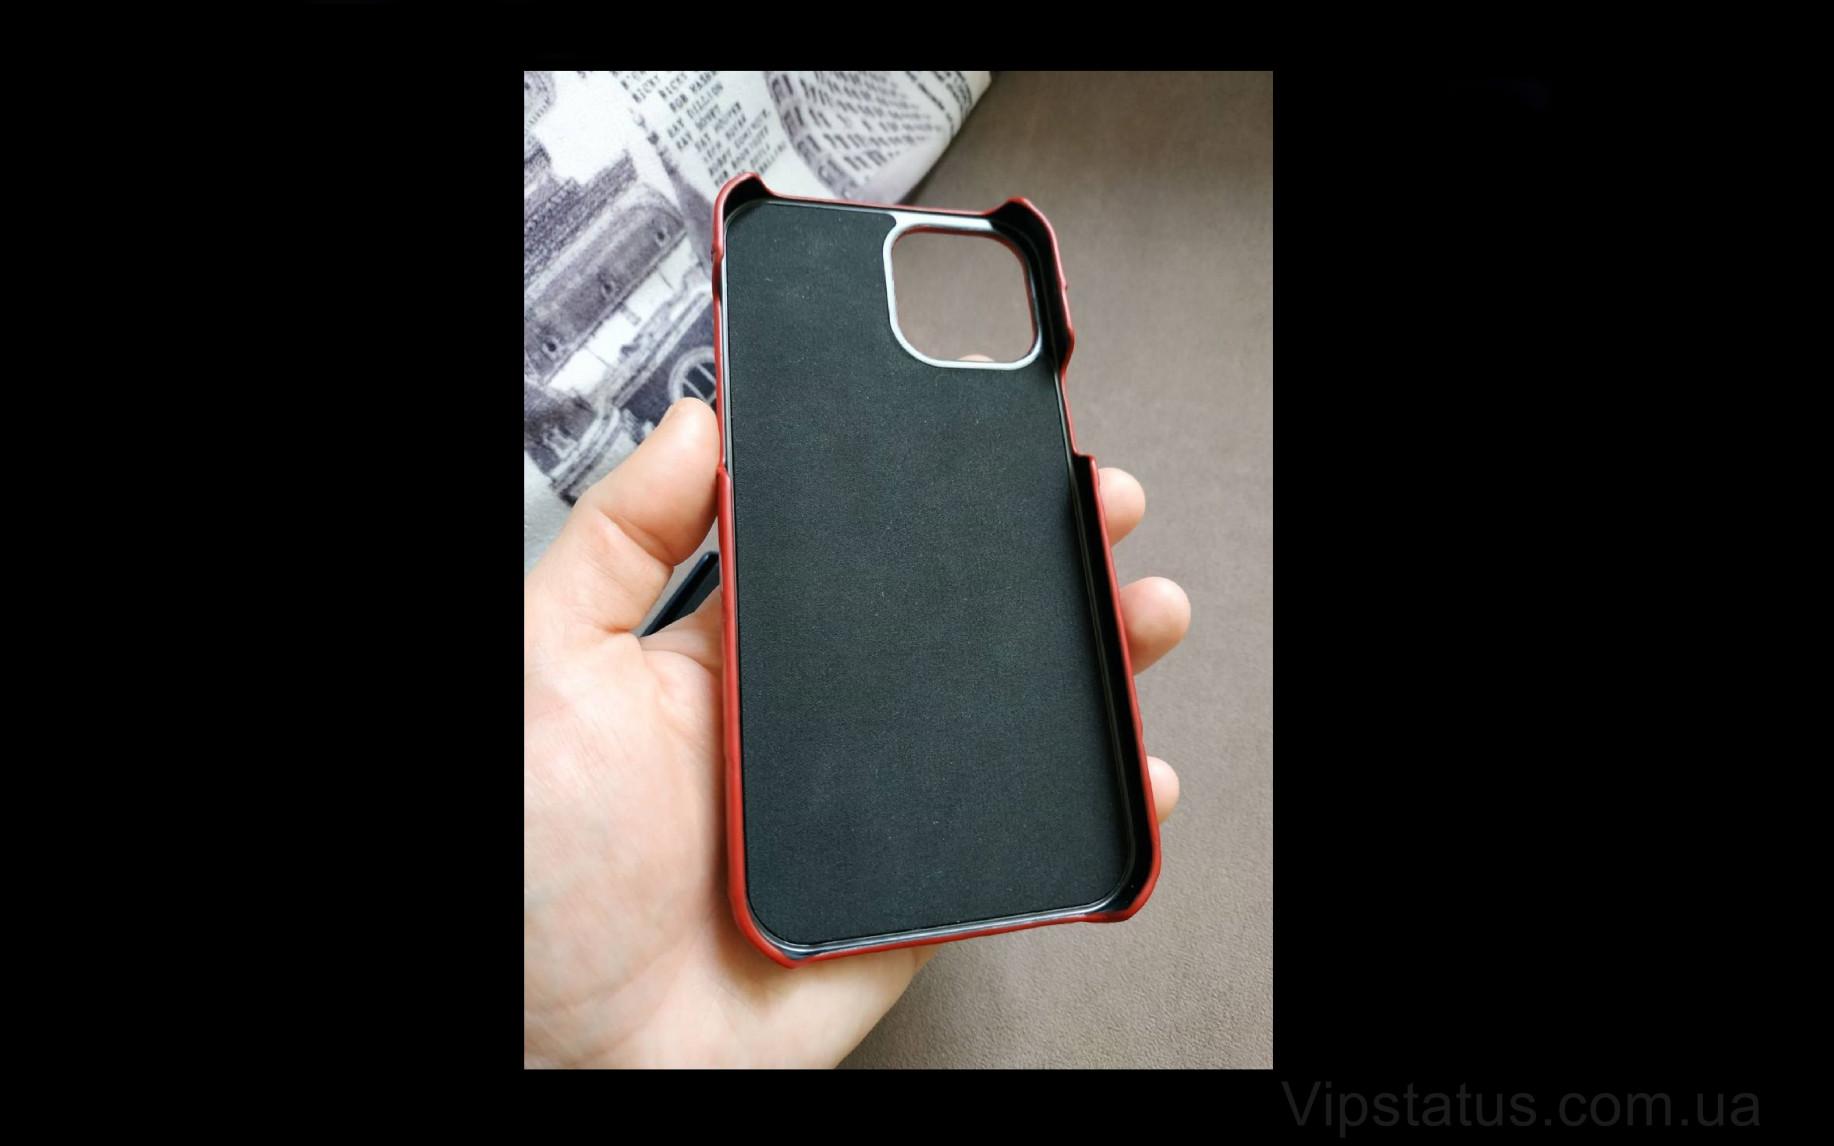 Elite Premium Gloss Люксовый чехол IPhone 11 12 Pro Max Premium Gloss Luxury case IPhone 11 12 Pro Max Crocodile leather image 2